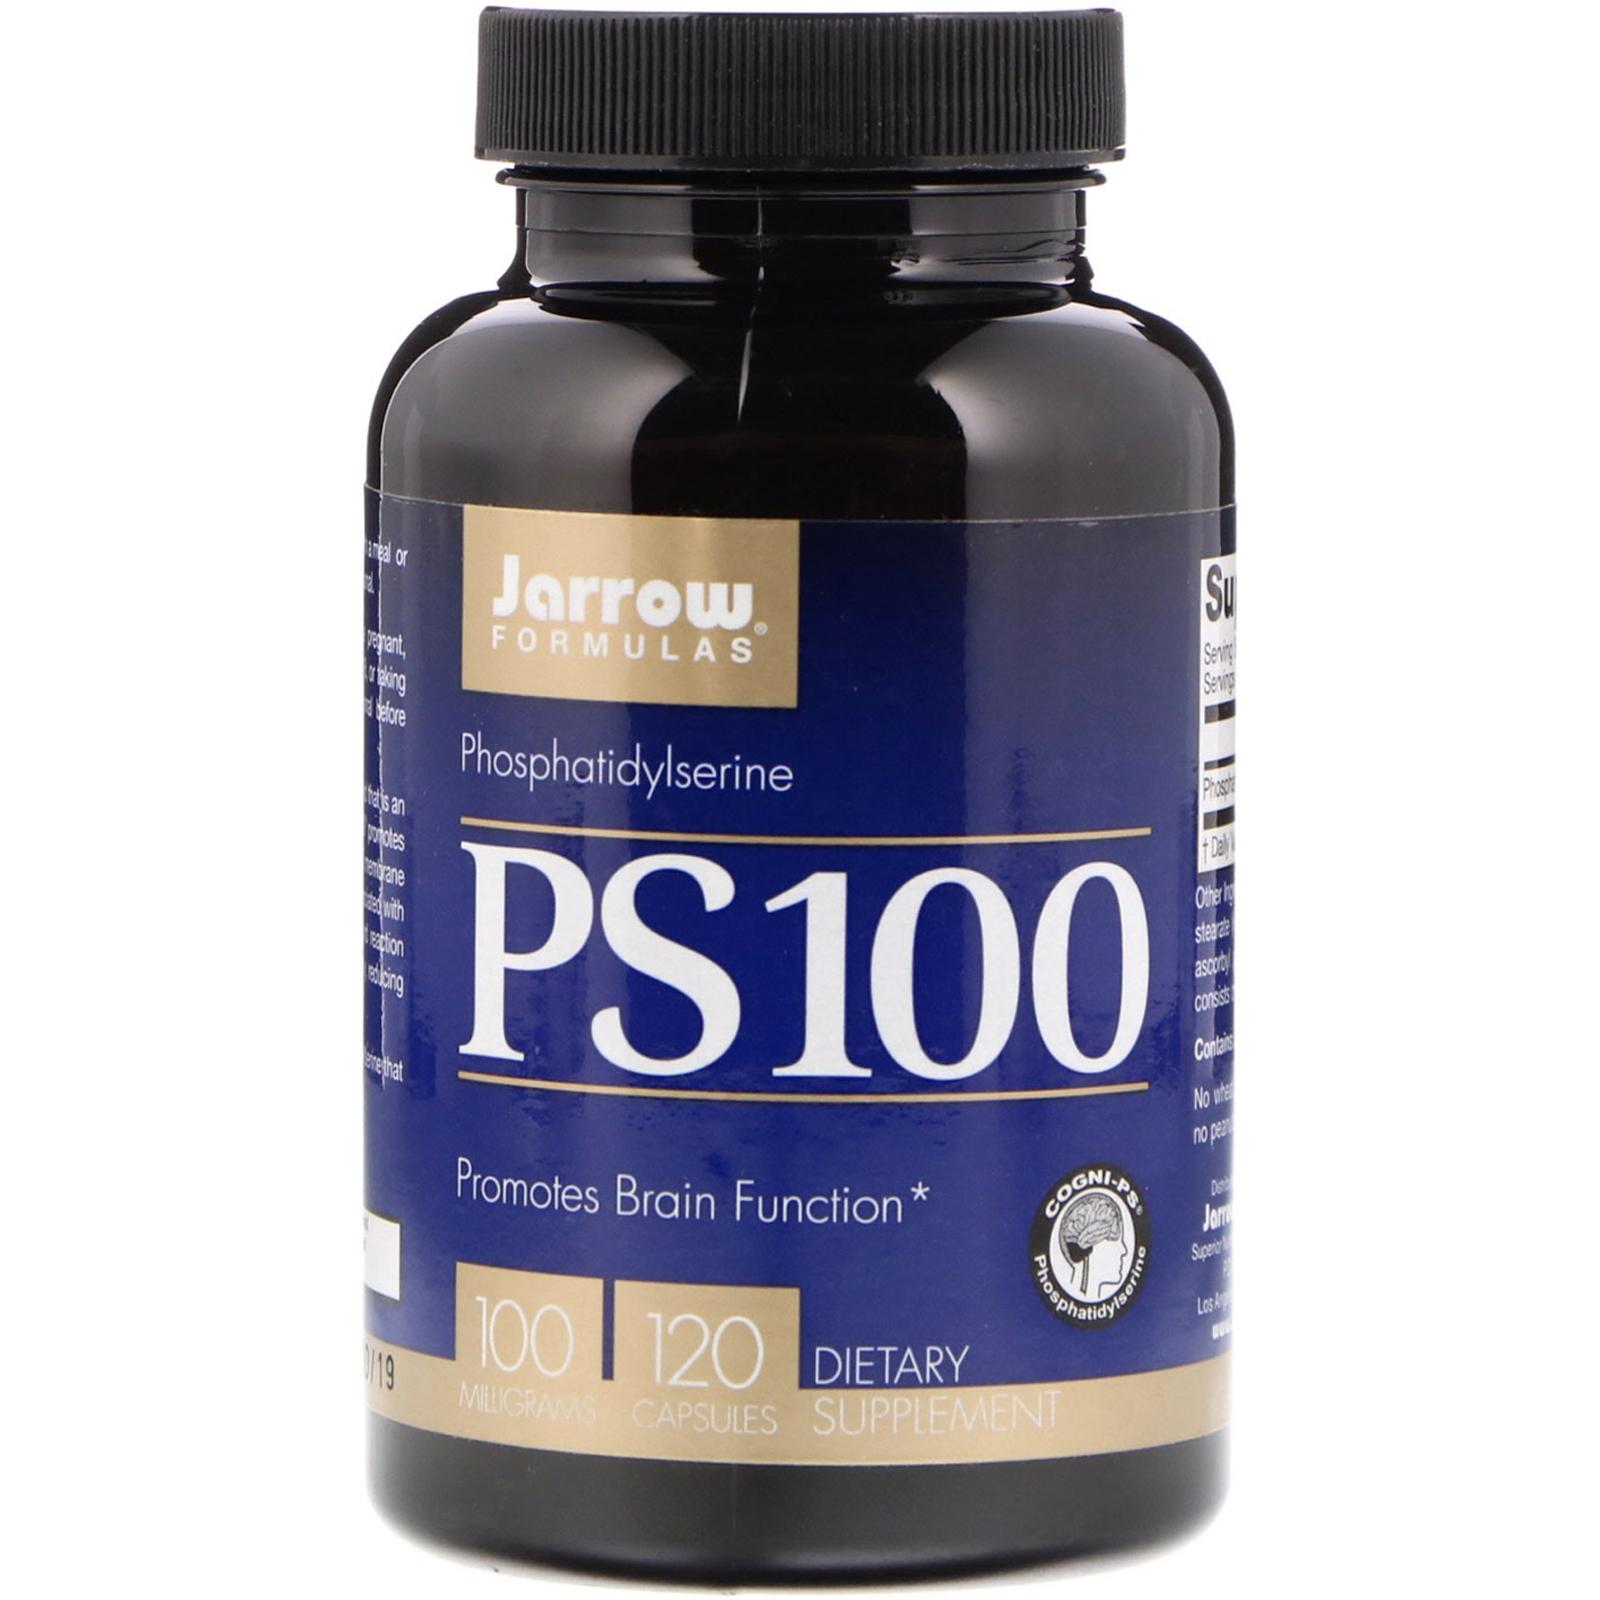 phosphatidylserine help weight loss